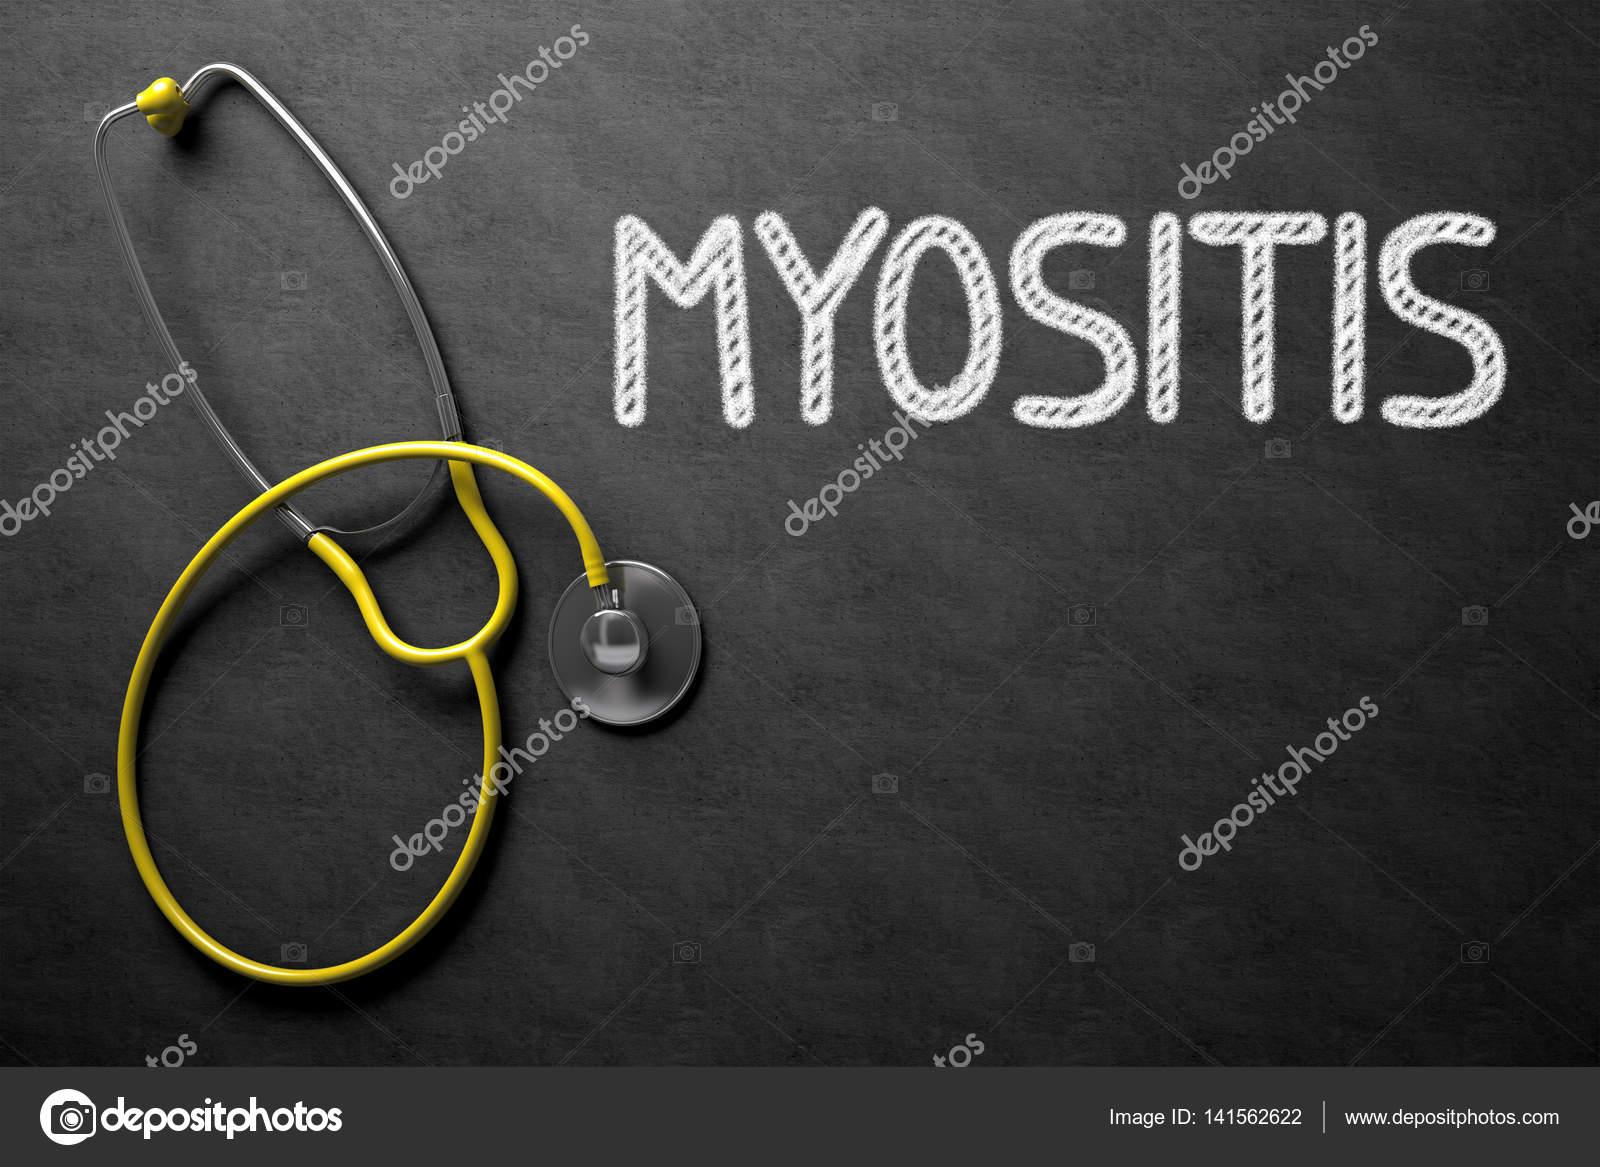 diabetes miositis